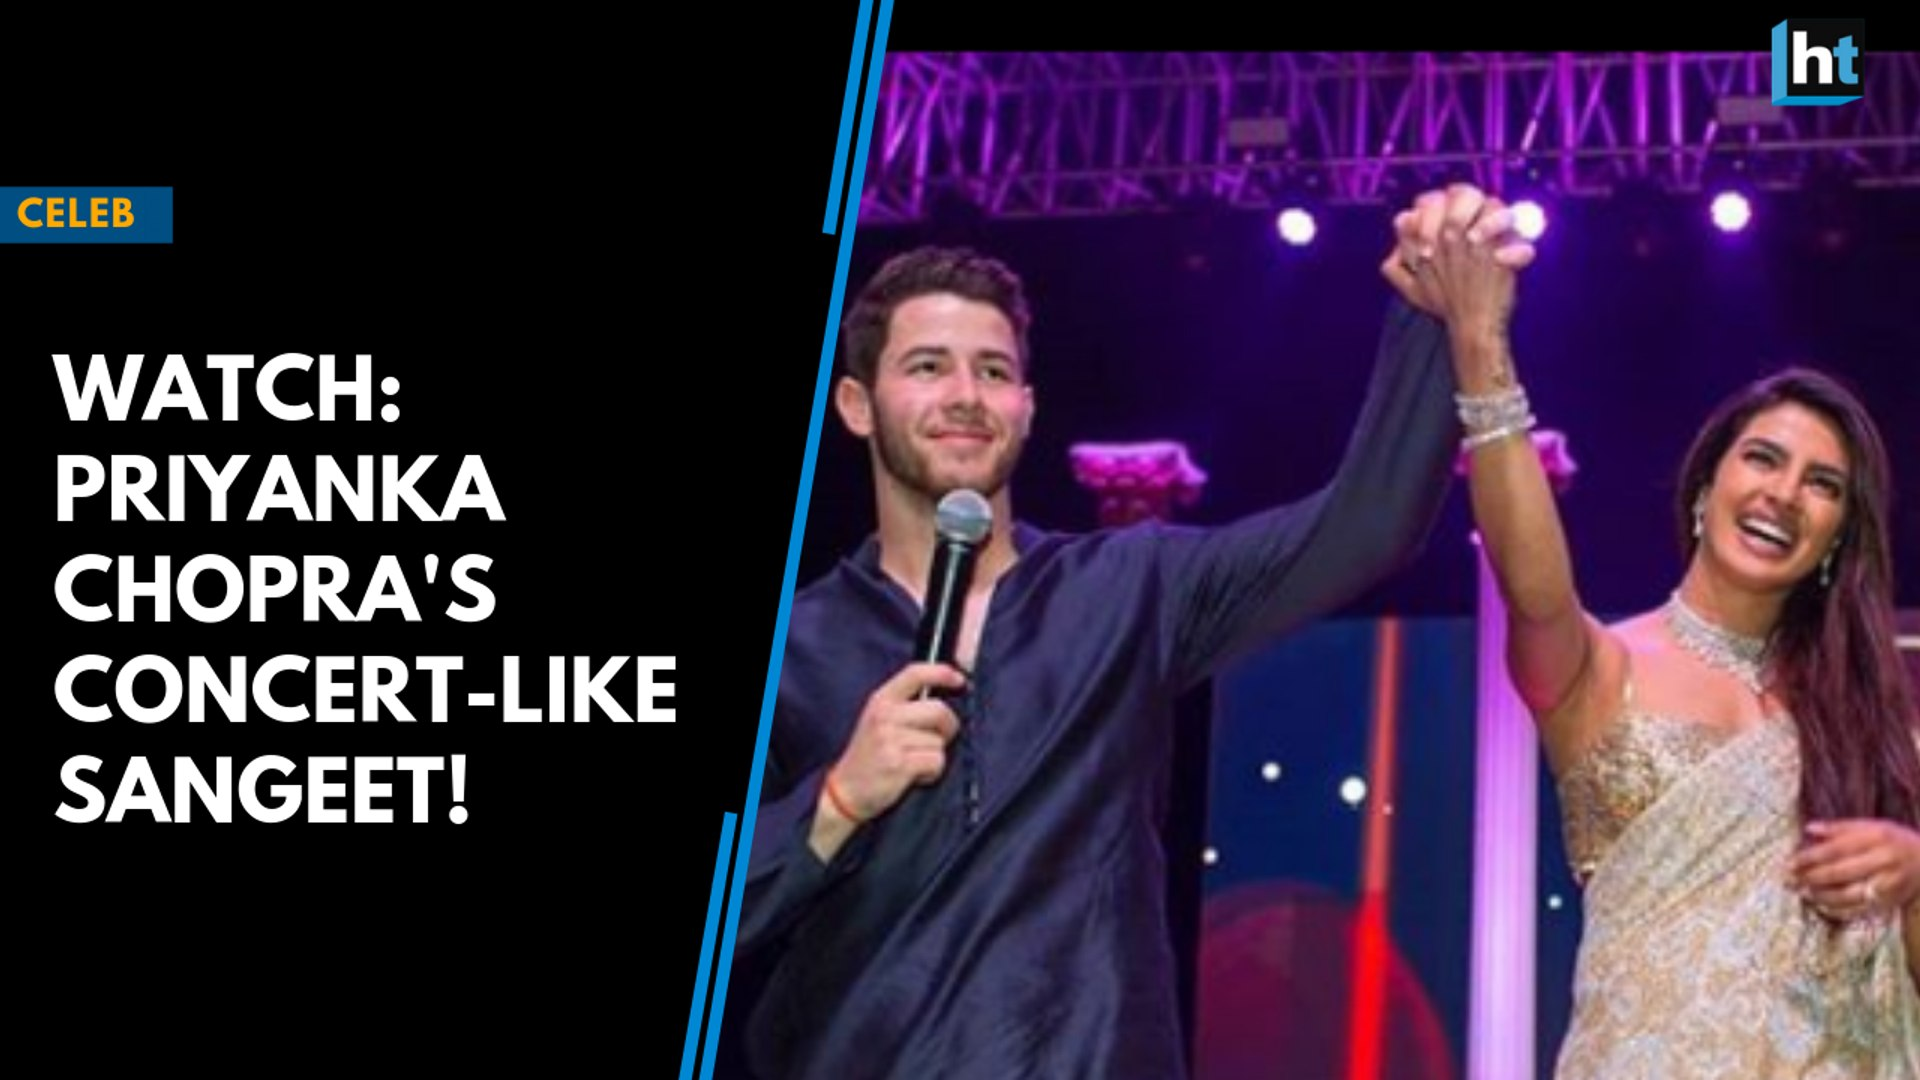 Watch: Priyanka Chopra and Nick Jonas' concert-like sangeet ceremony!